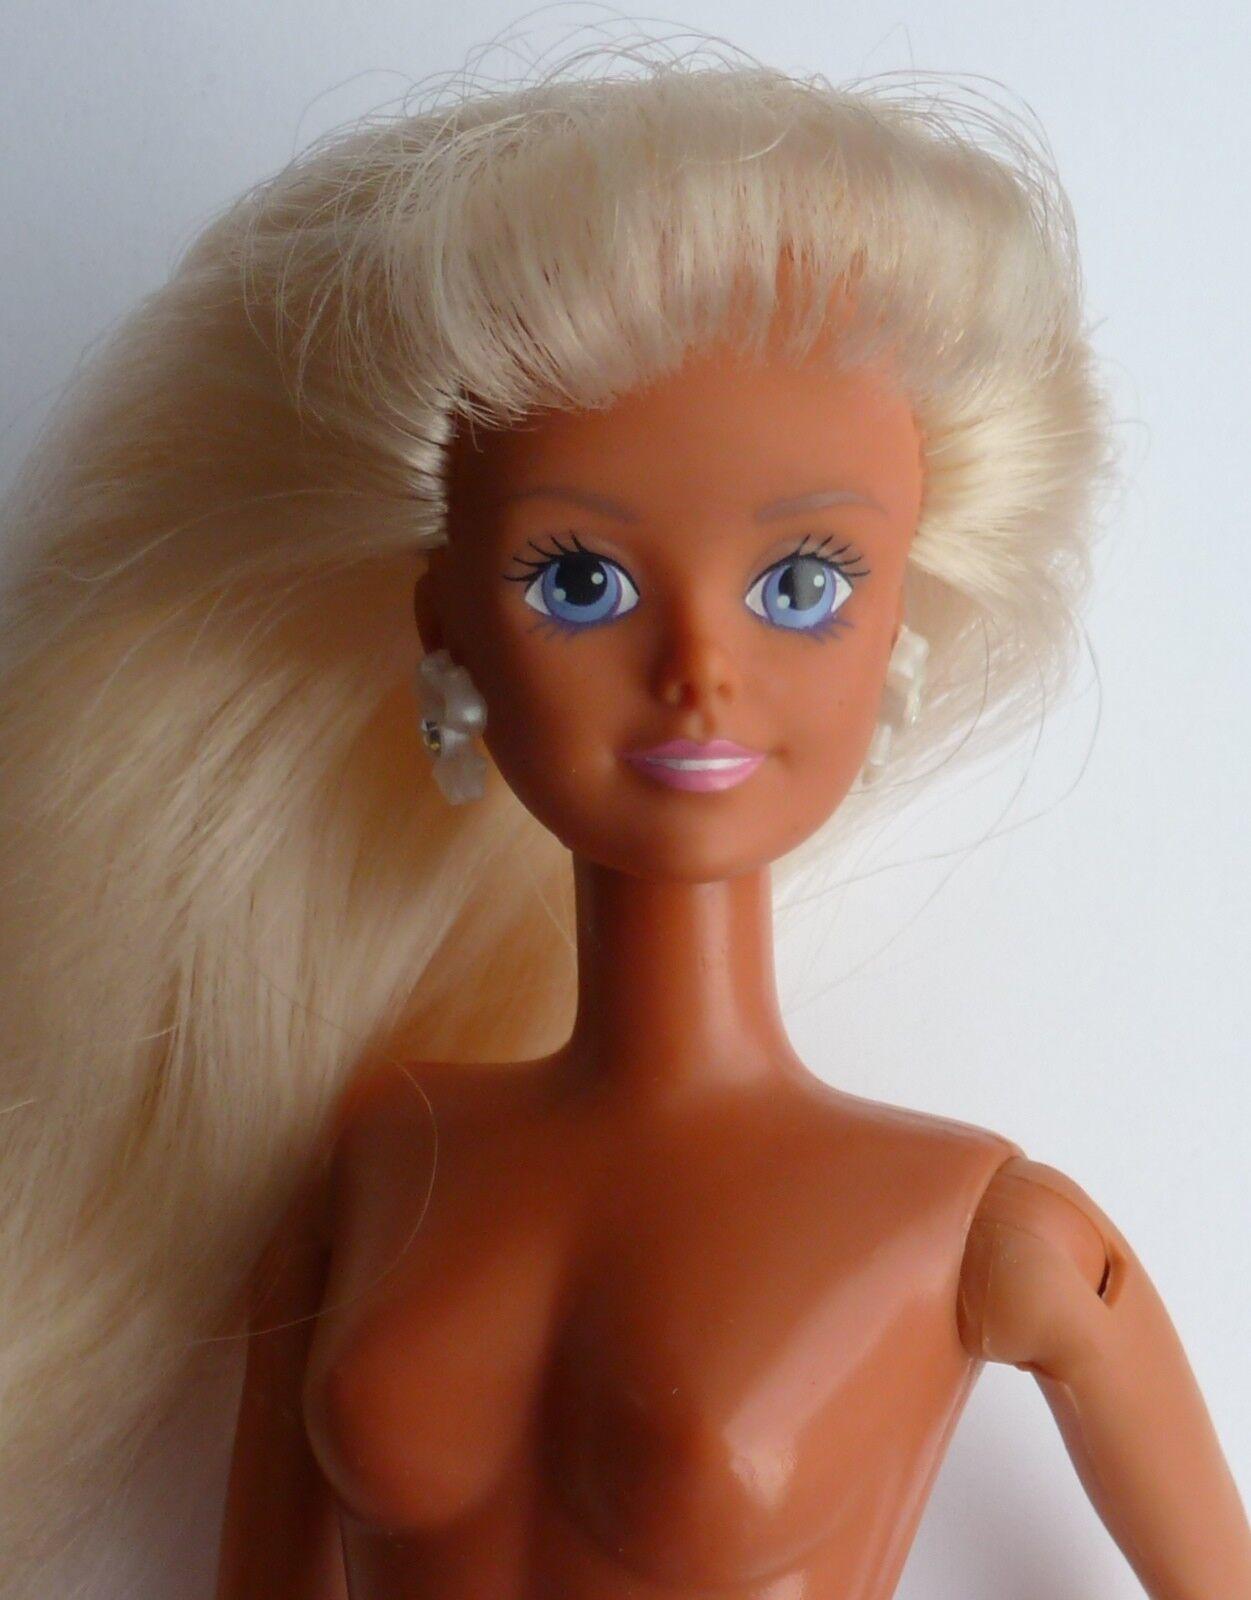 Molto RARO VINTAGE 1990 HASBRO Periodo edoardiano Sindy doll.